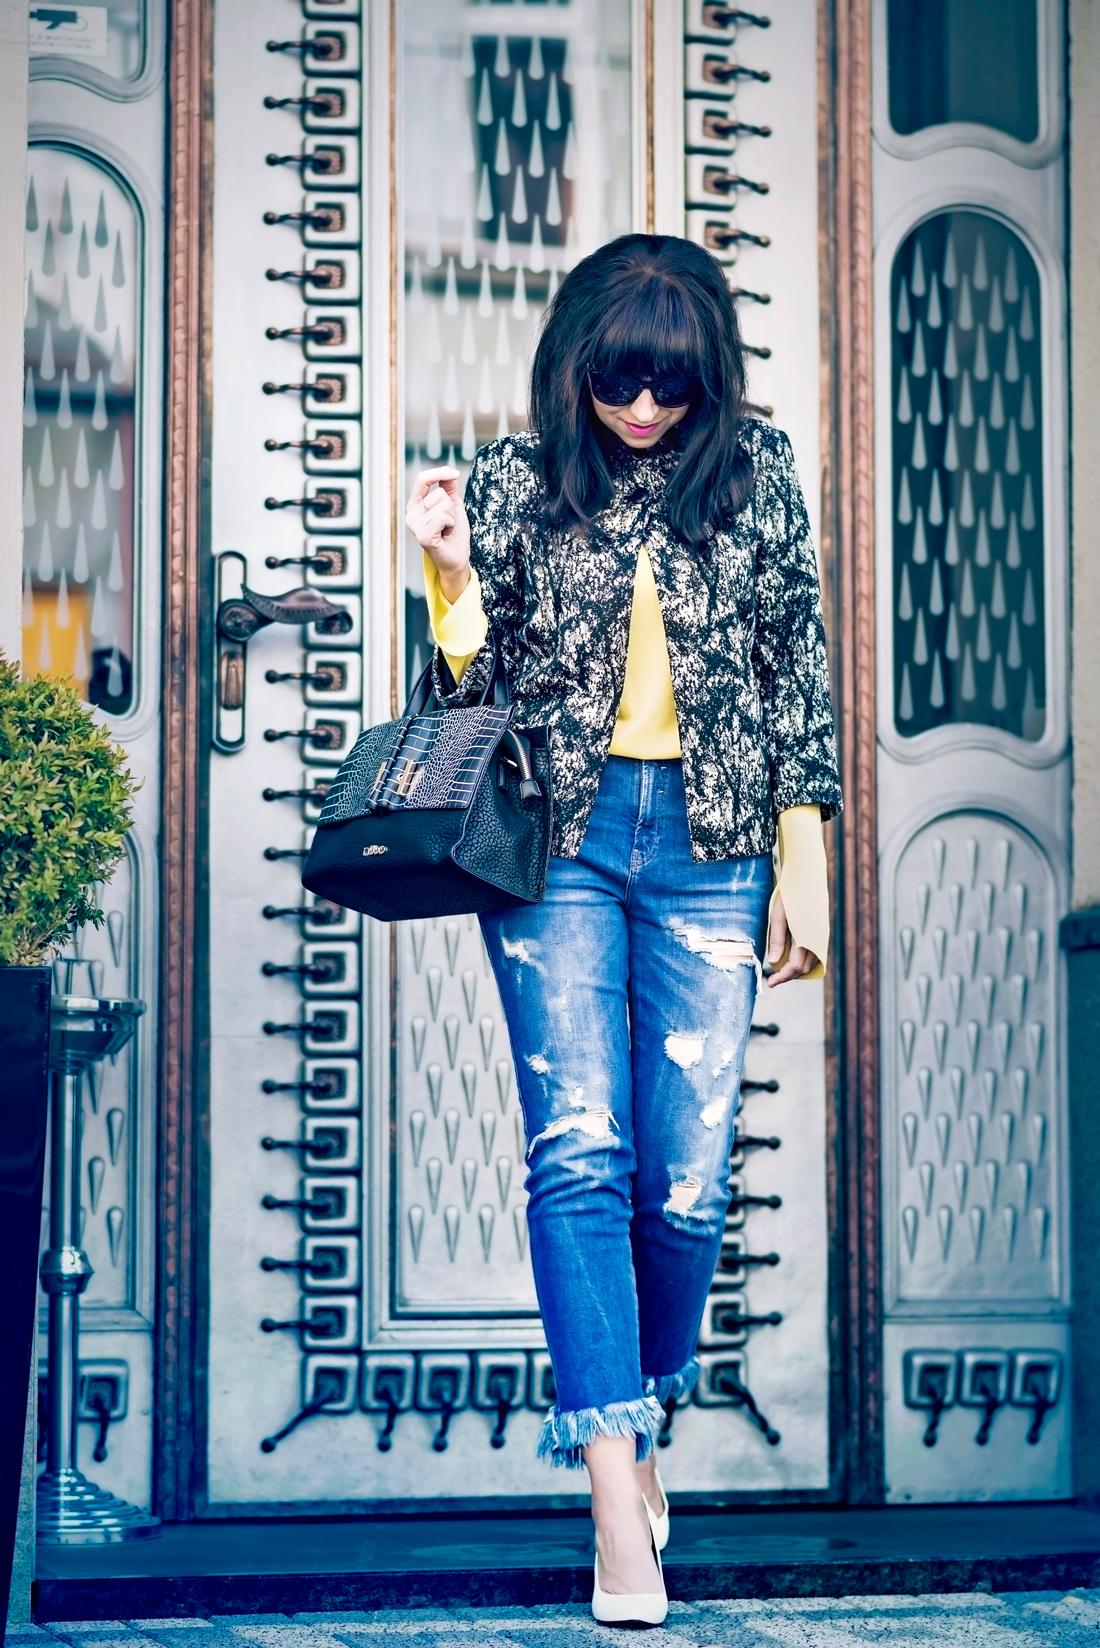 Podľa čoho spoznáte nákupnú maniačku_Katharine-fashion is beautiful_Blog 2_Tuliphousehotel_Džínsy Zara_Biele lodičky Kati_Okuliare Misteroptic_Katarína Jakubčová_Fashion blogger